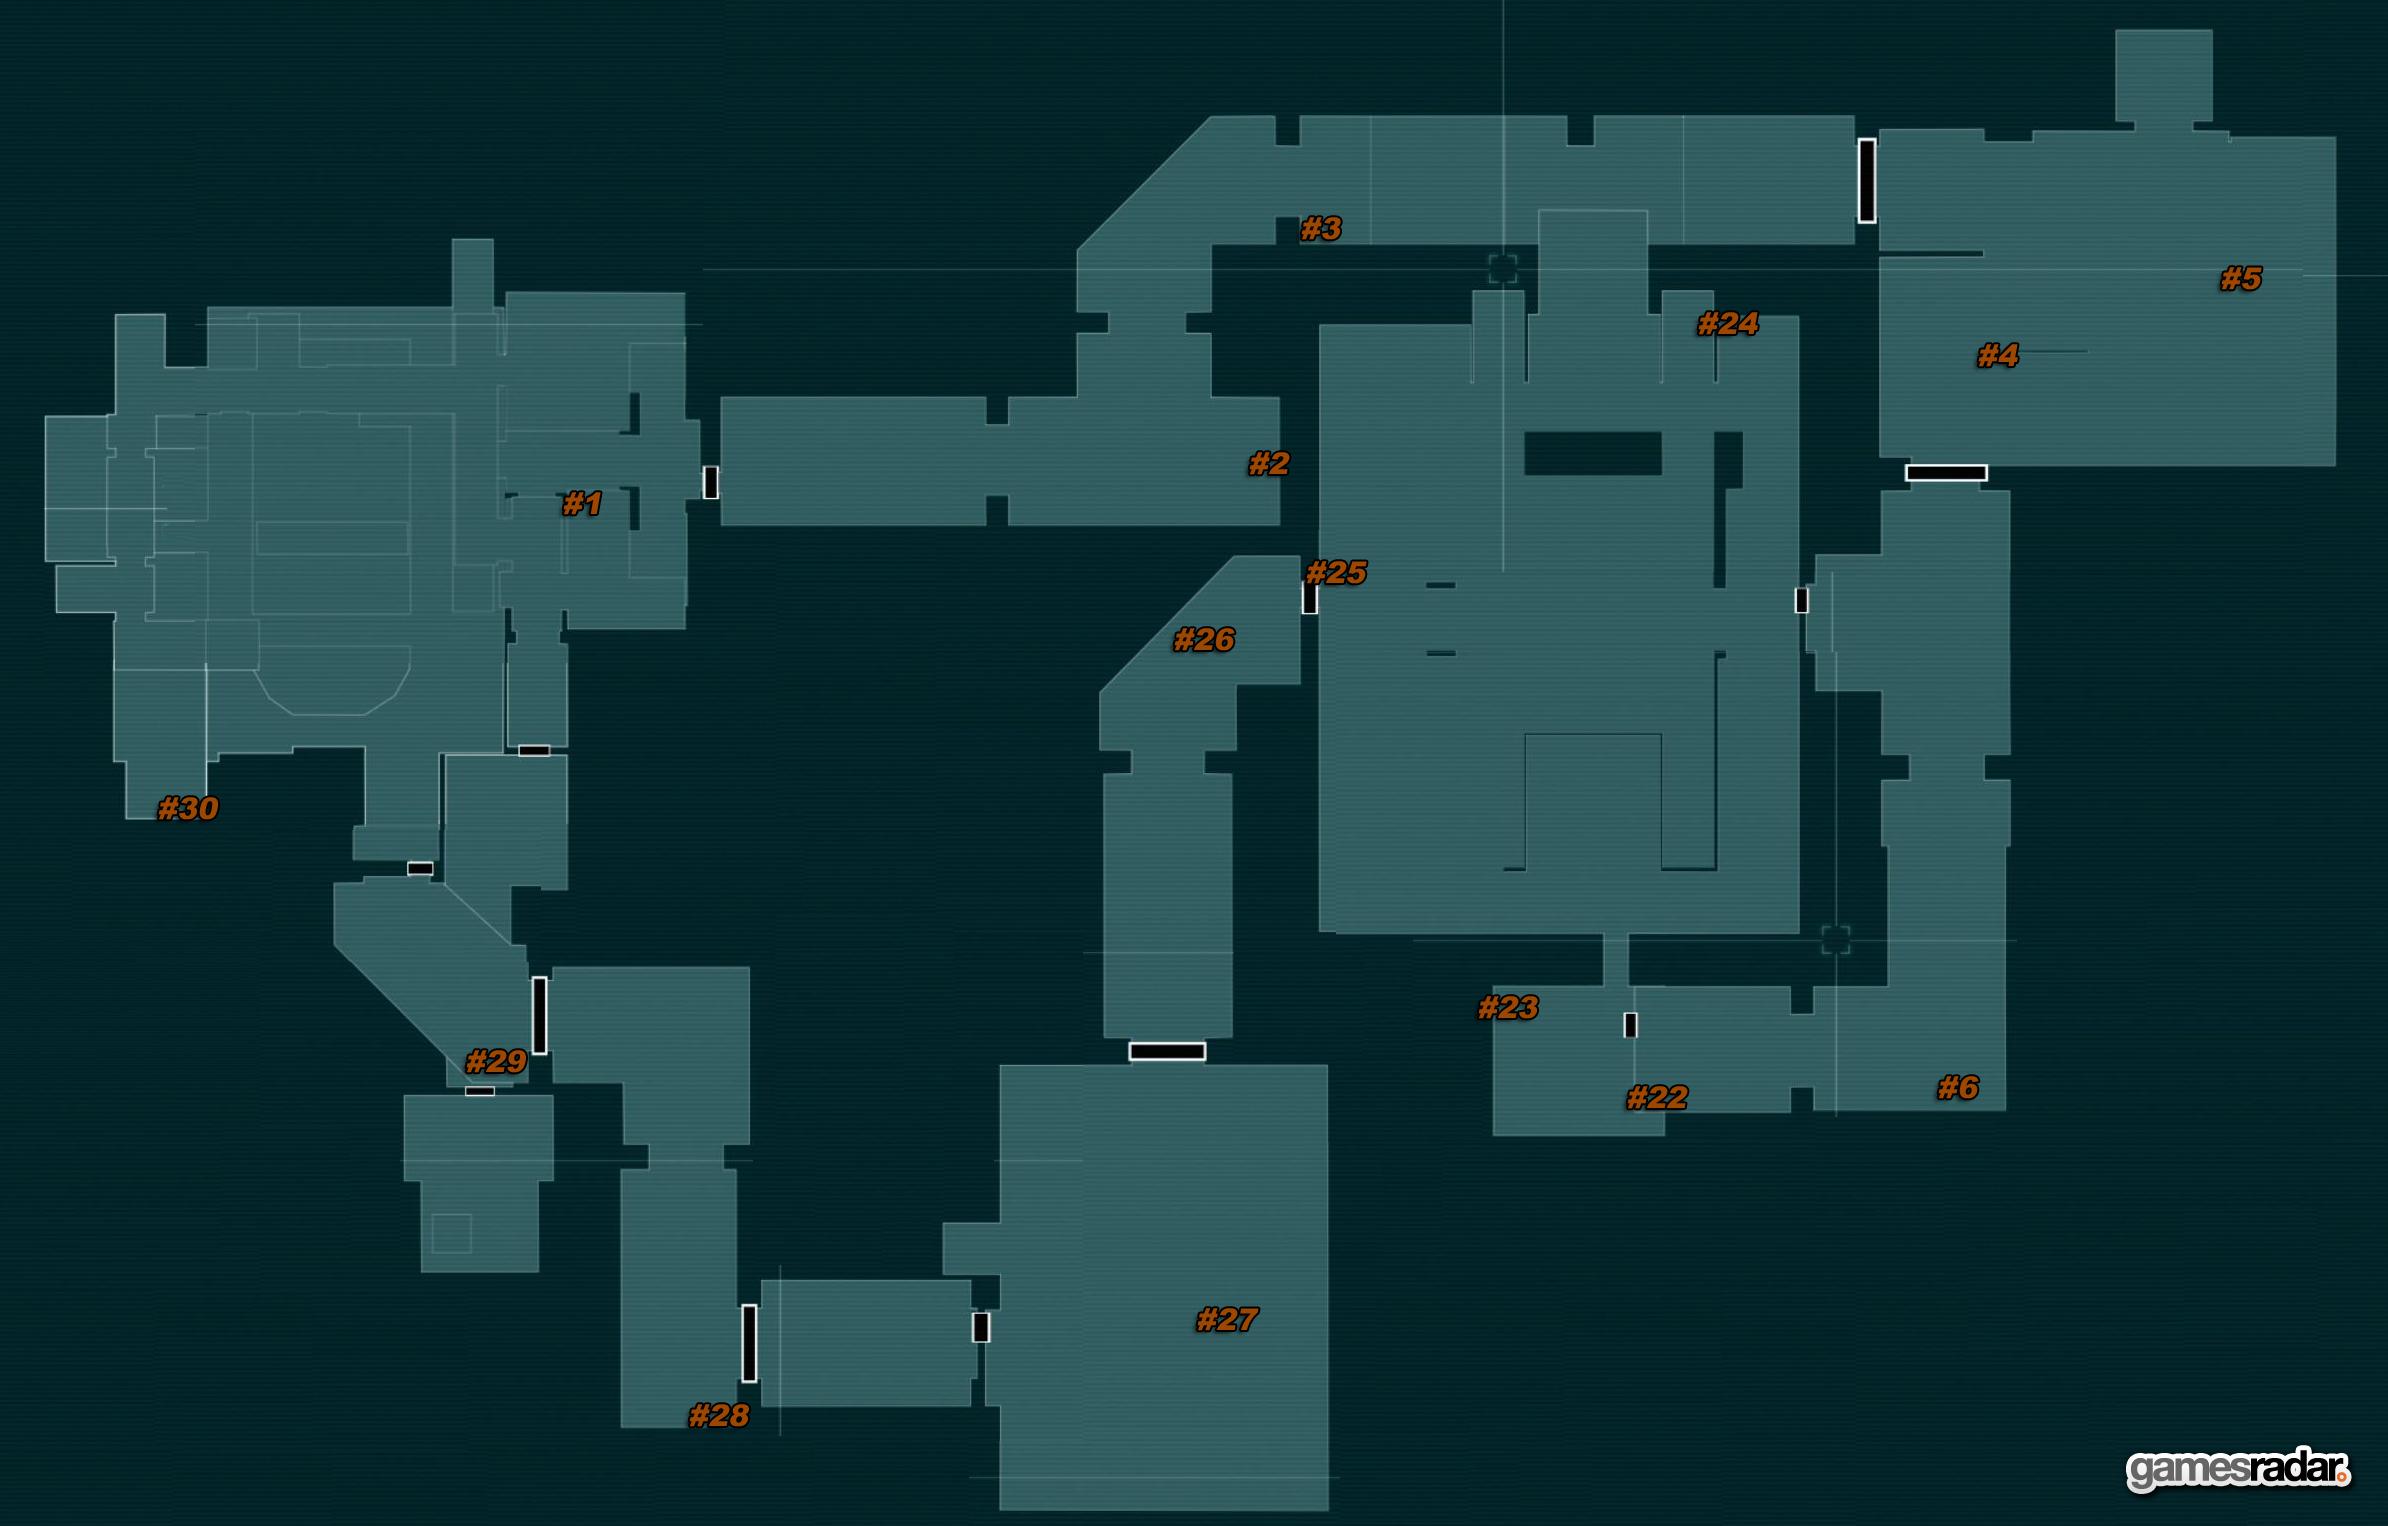 HQR_shipyard%20map.jpg